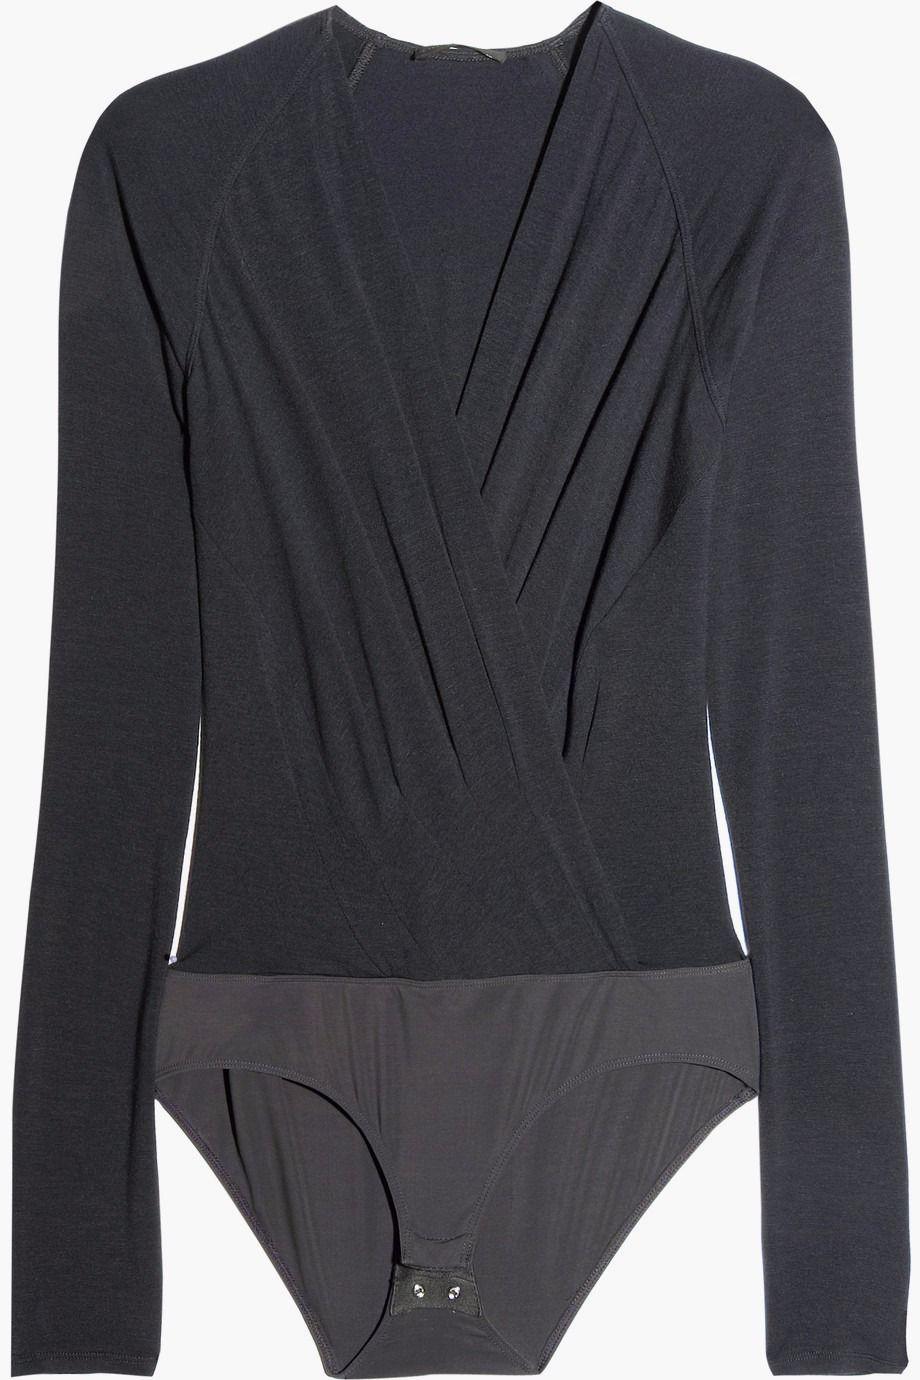 c5461e08884a As Donna Karan steps down, remember the bodysuit — Quartz